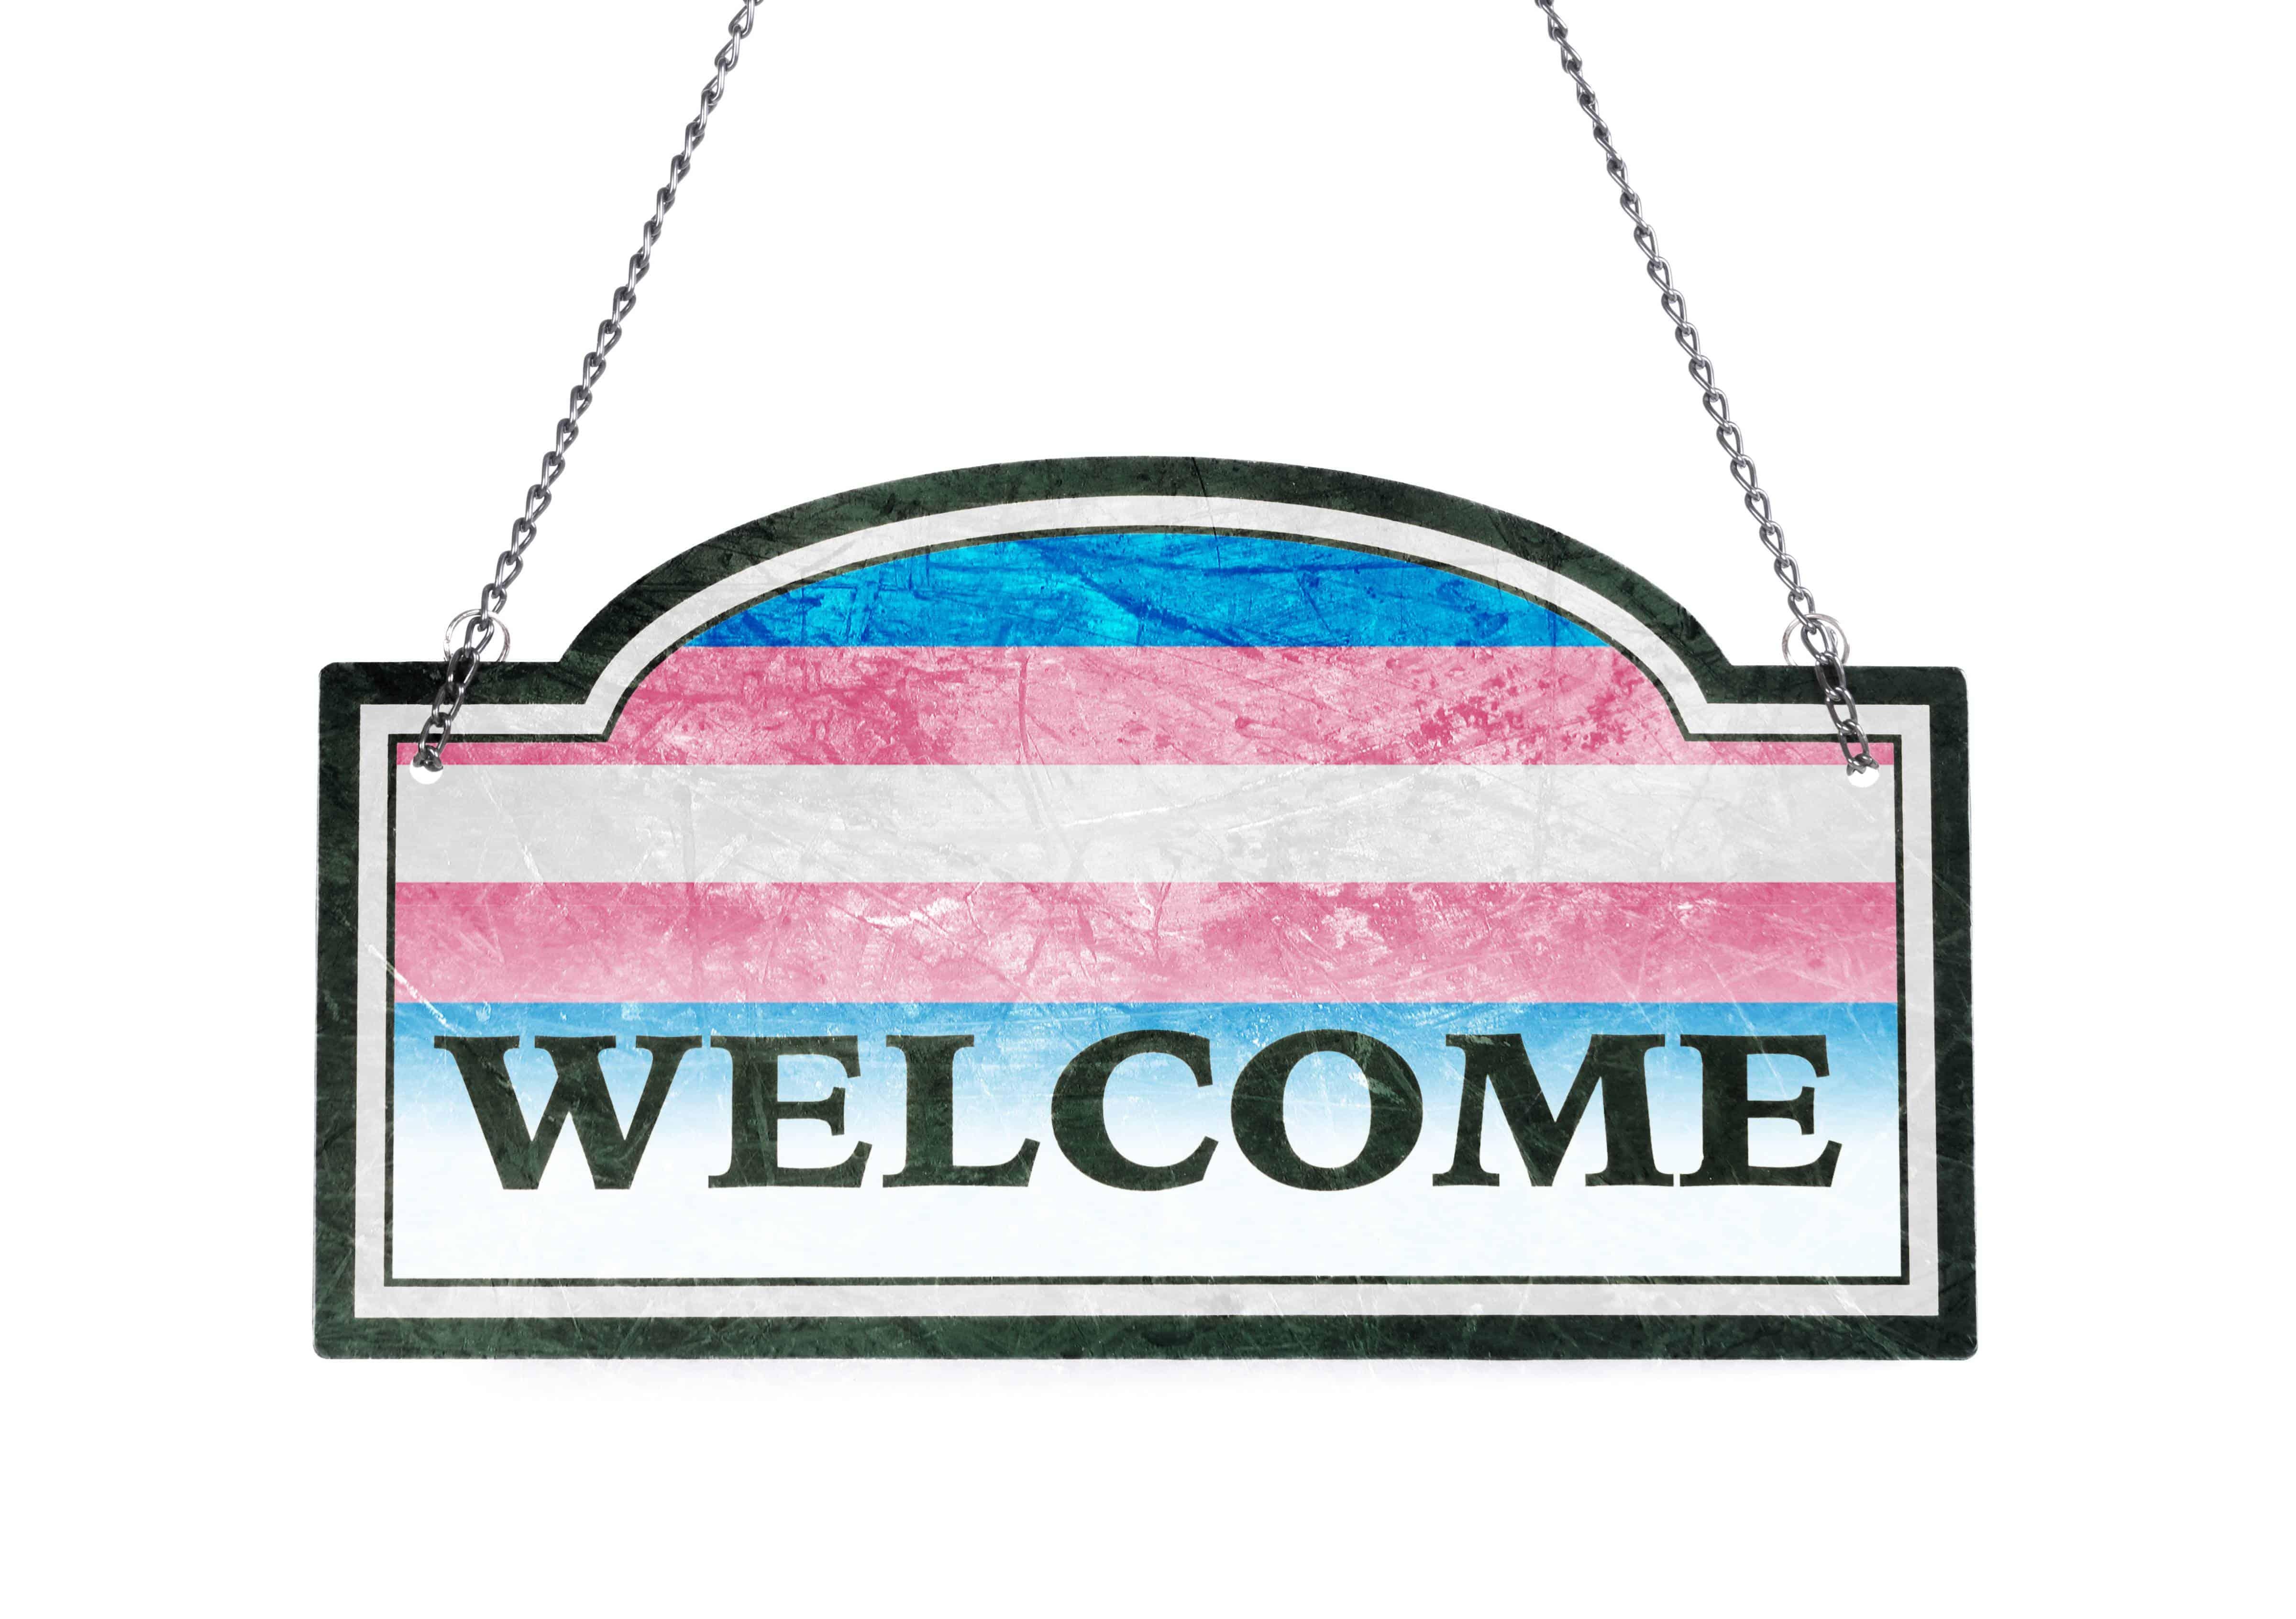 Welcome sign with transgender flag background - transgender inclusion